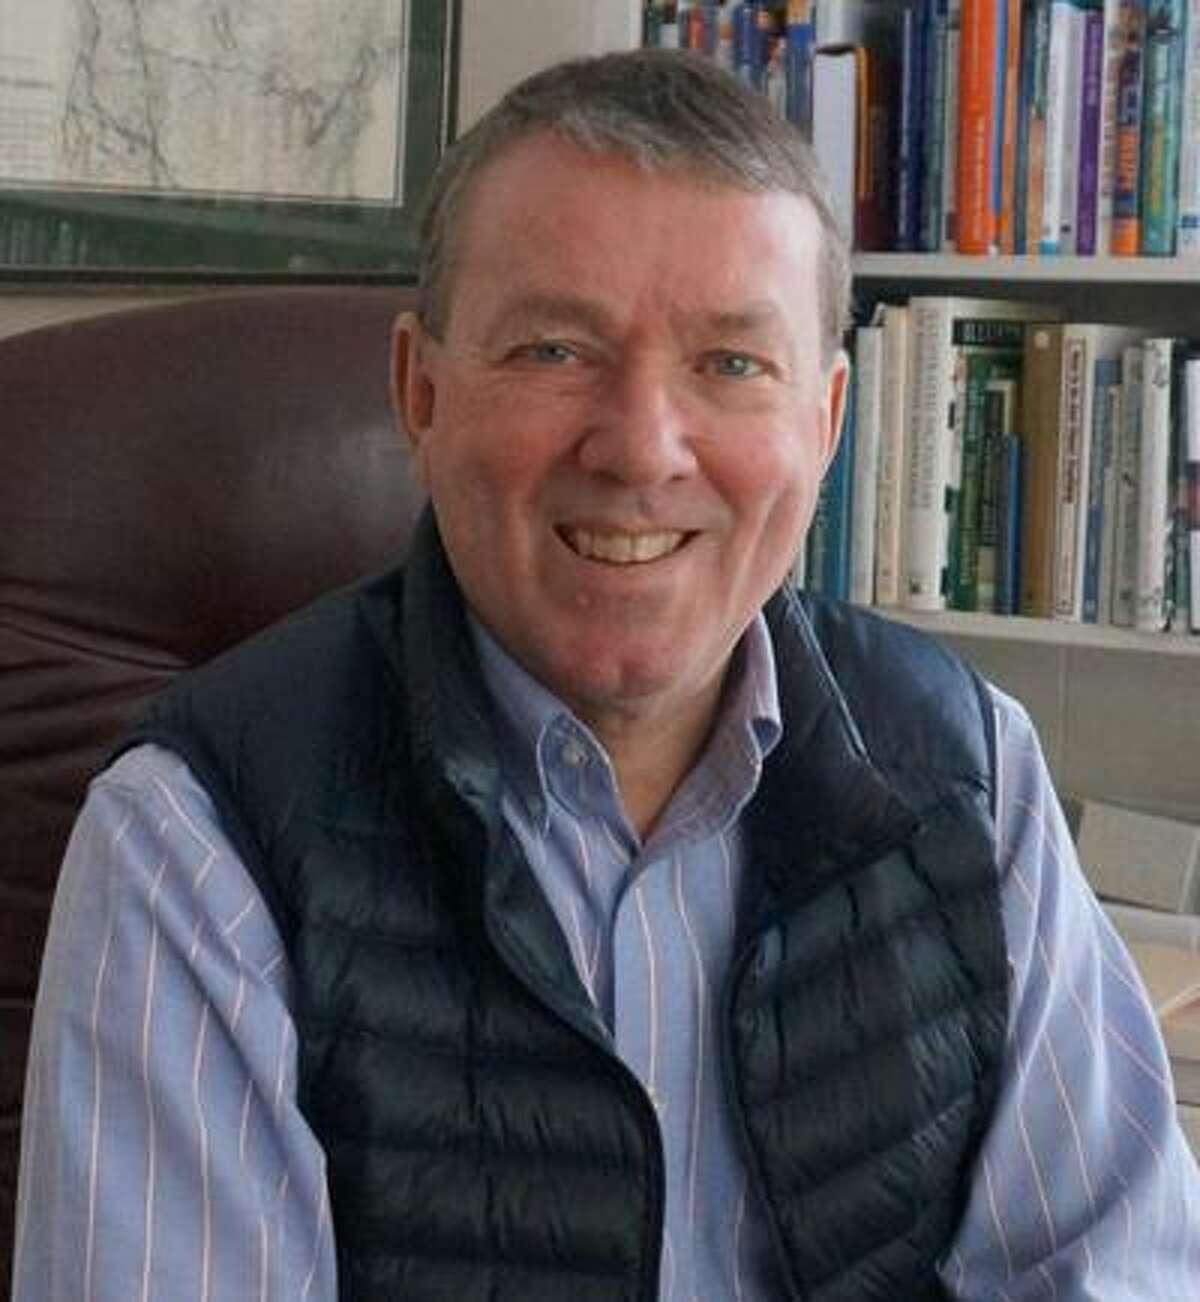 Richard Creeth